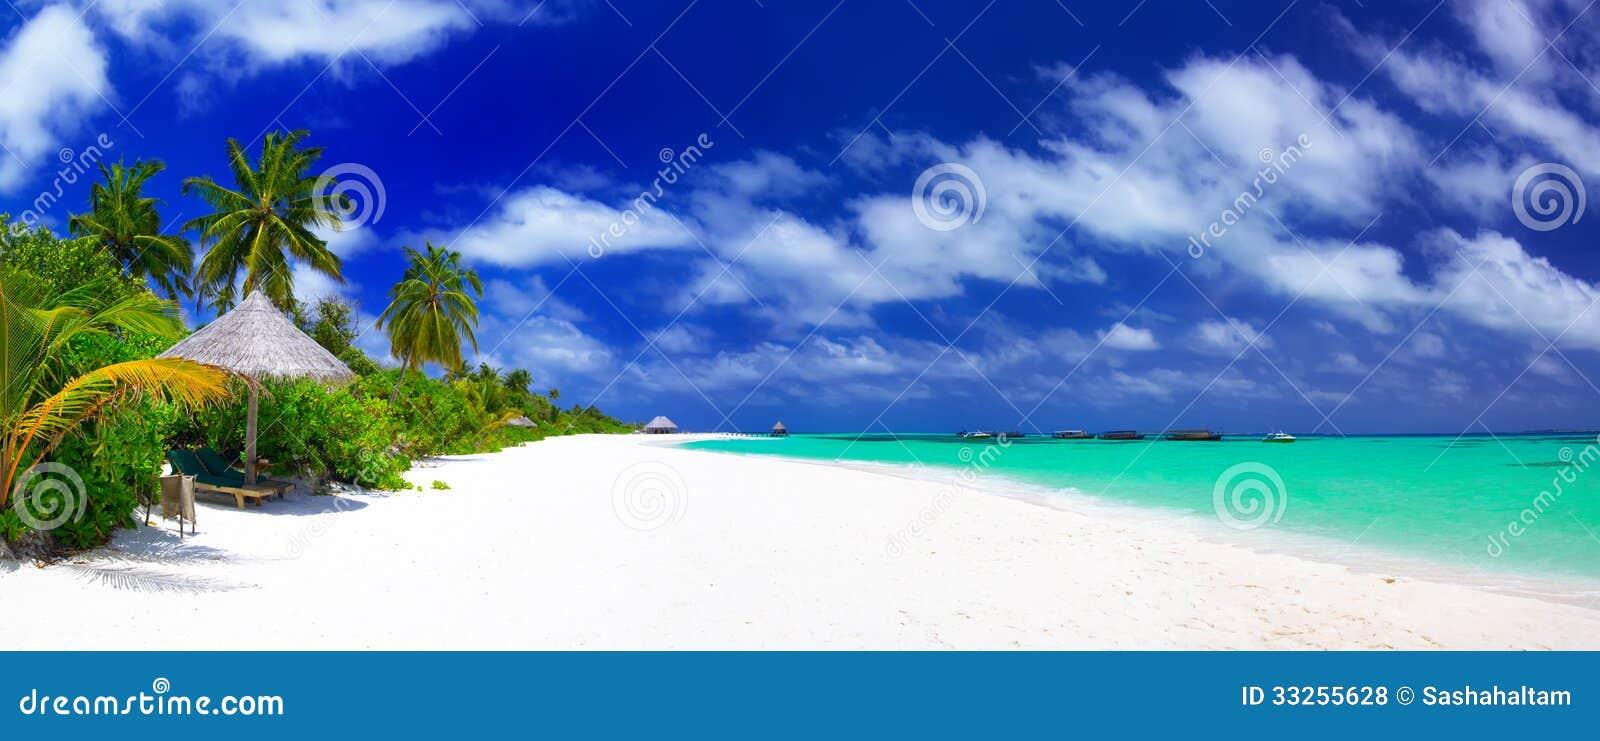 Image Result For Ocean Blue Sand Beach Resort